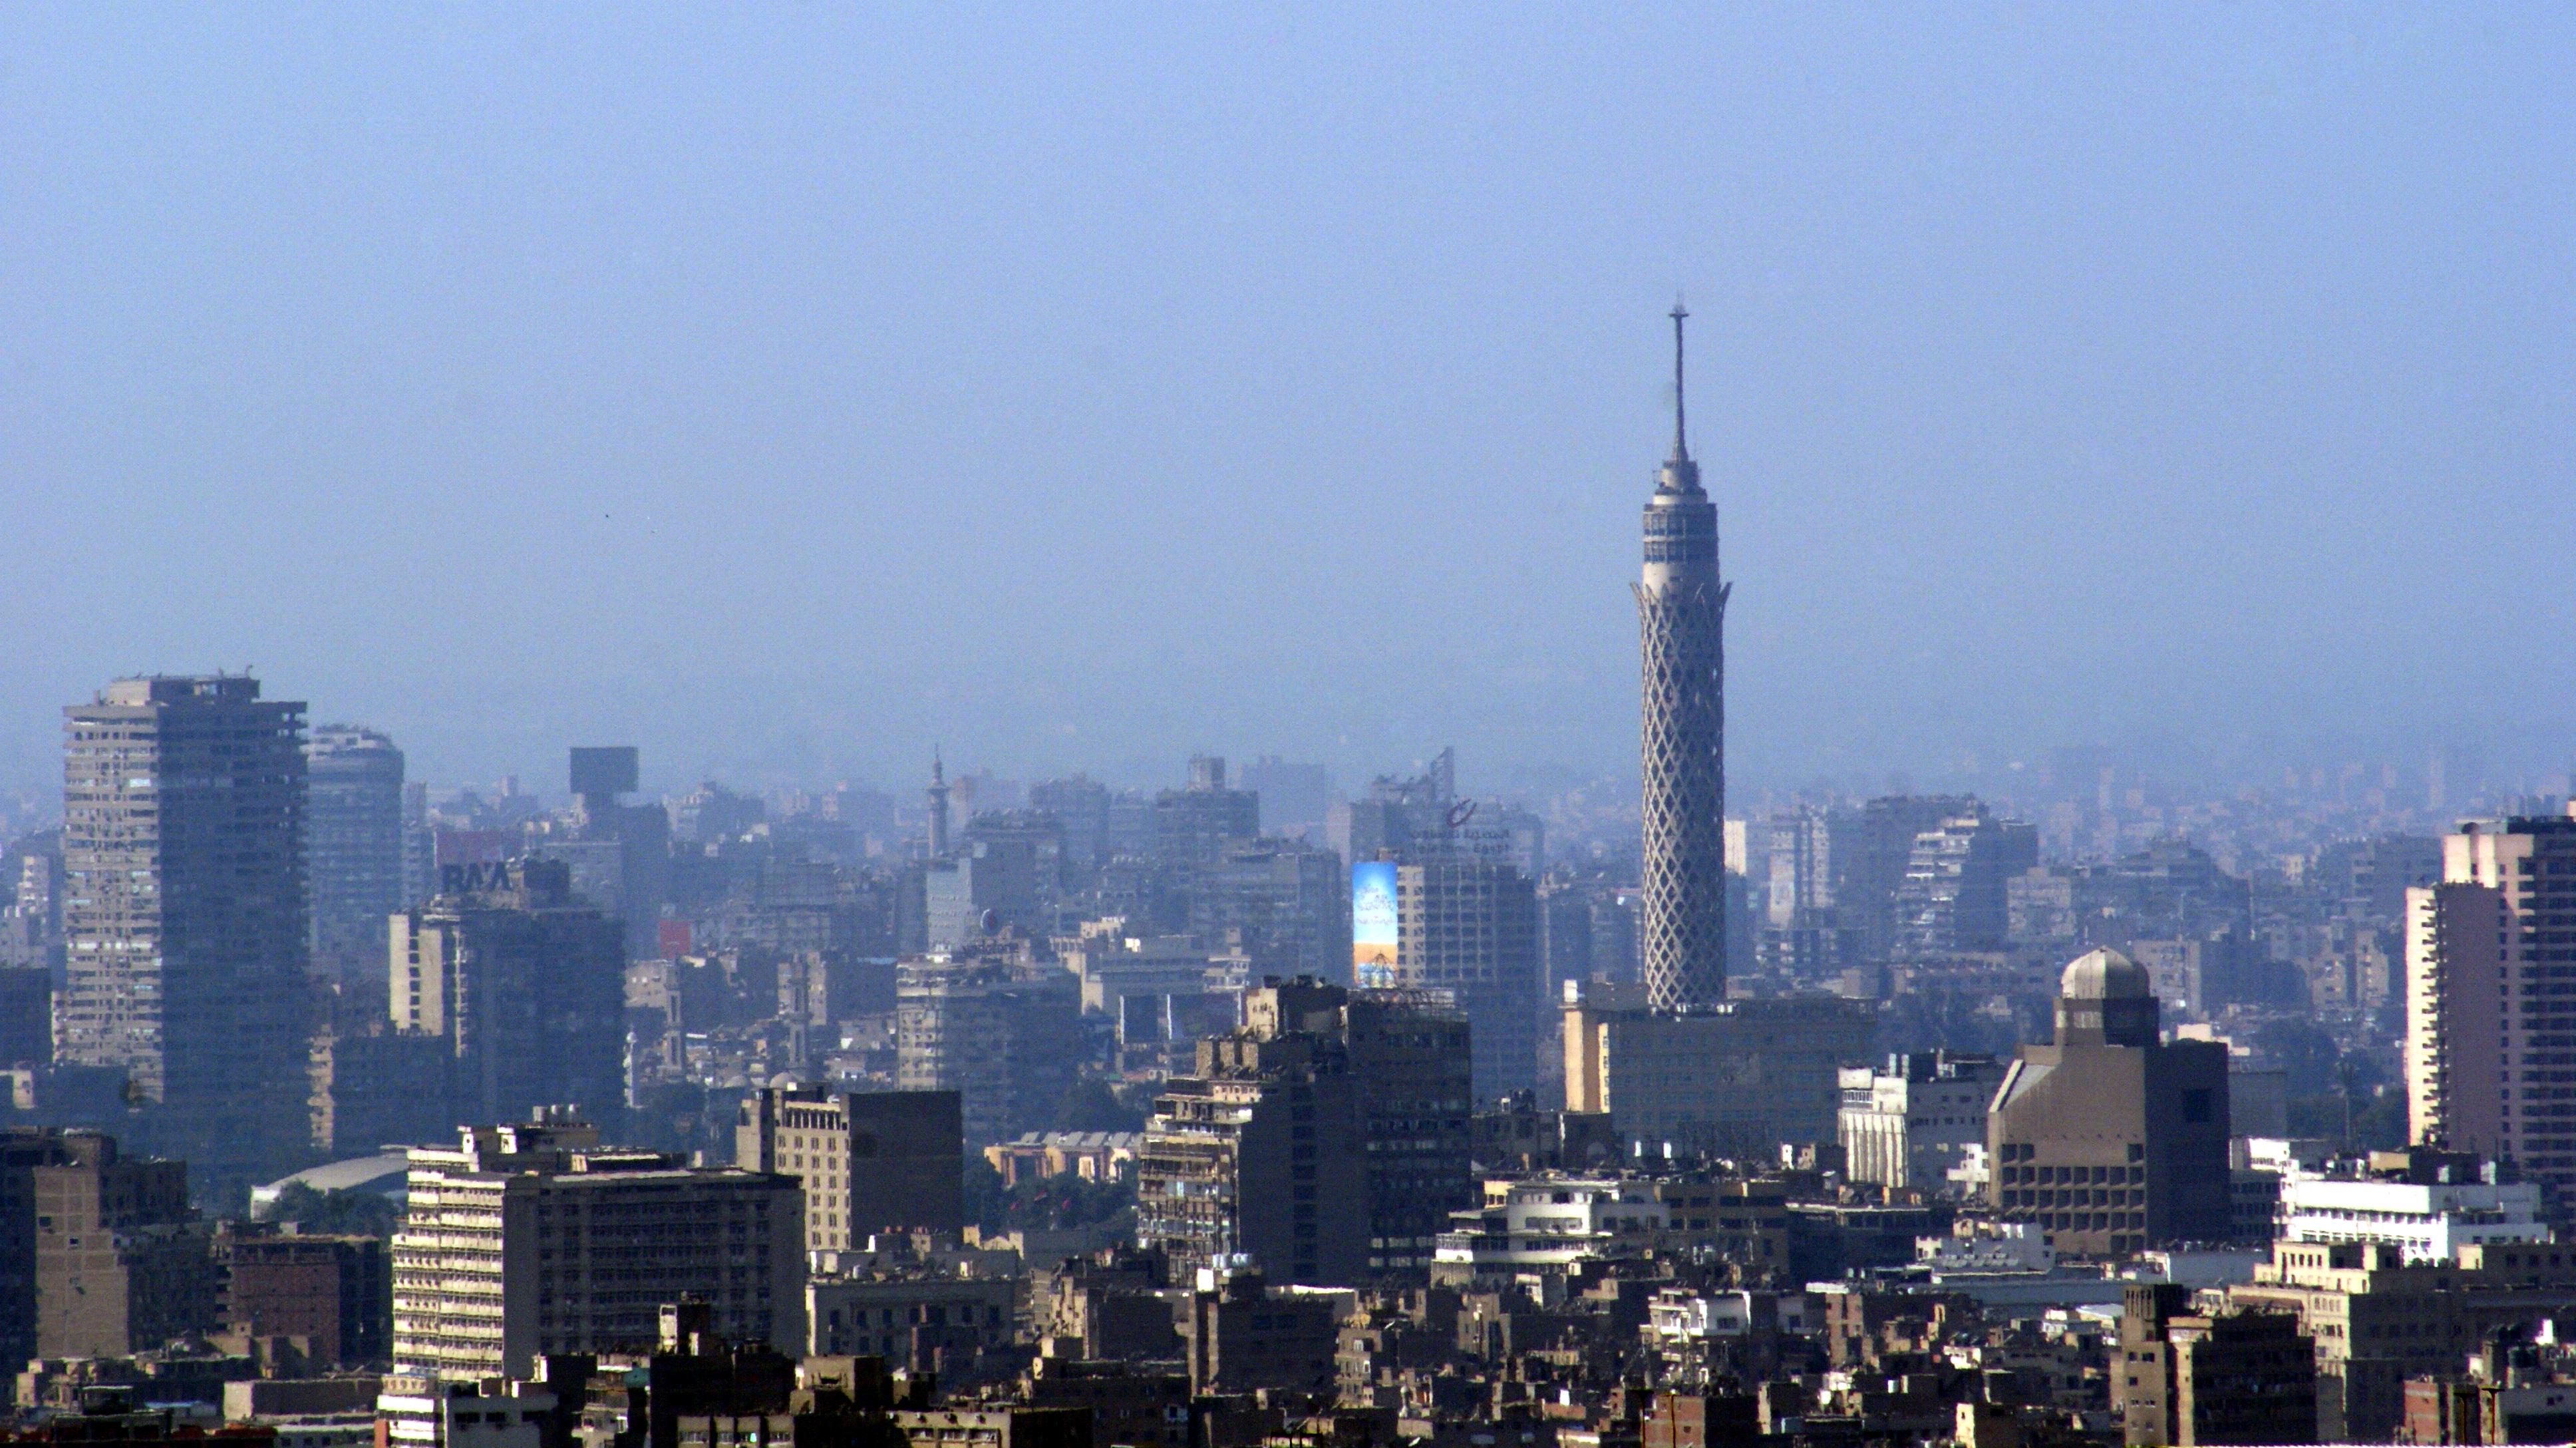 skyline1.jpg